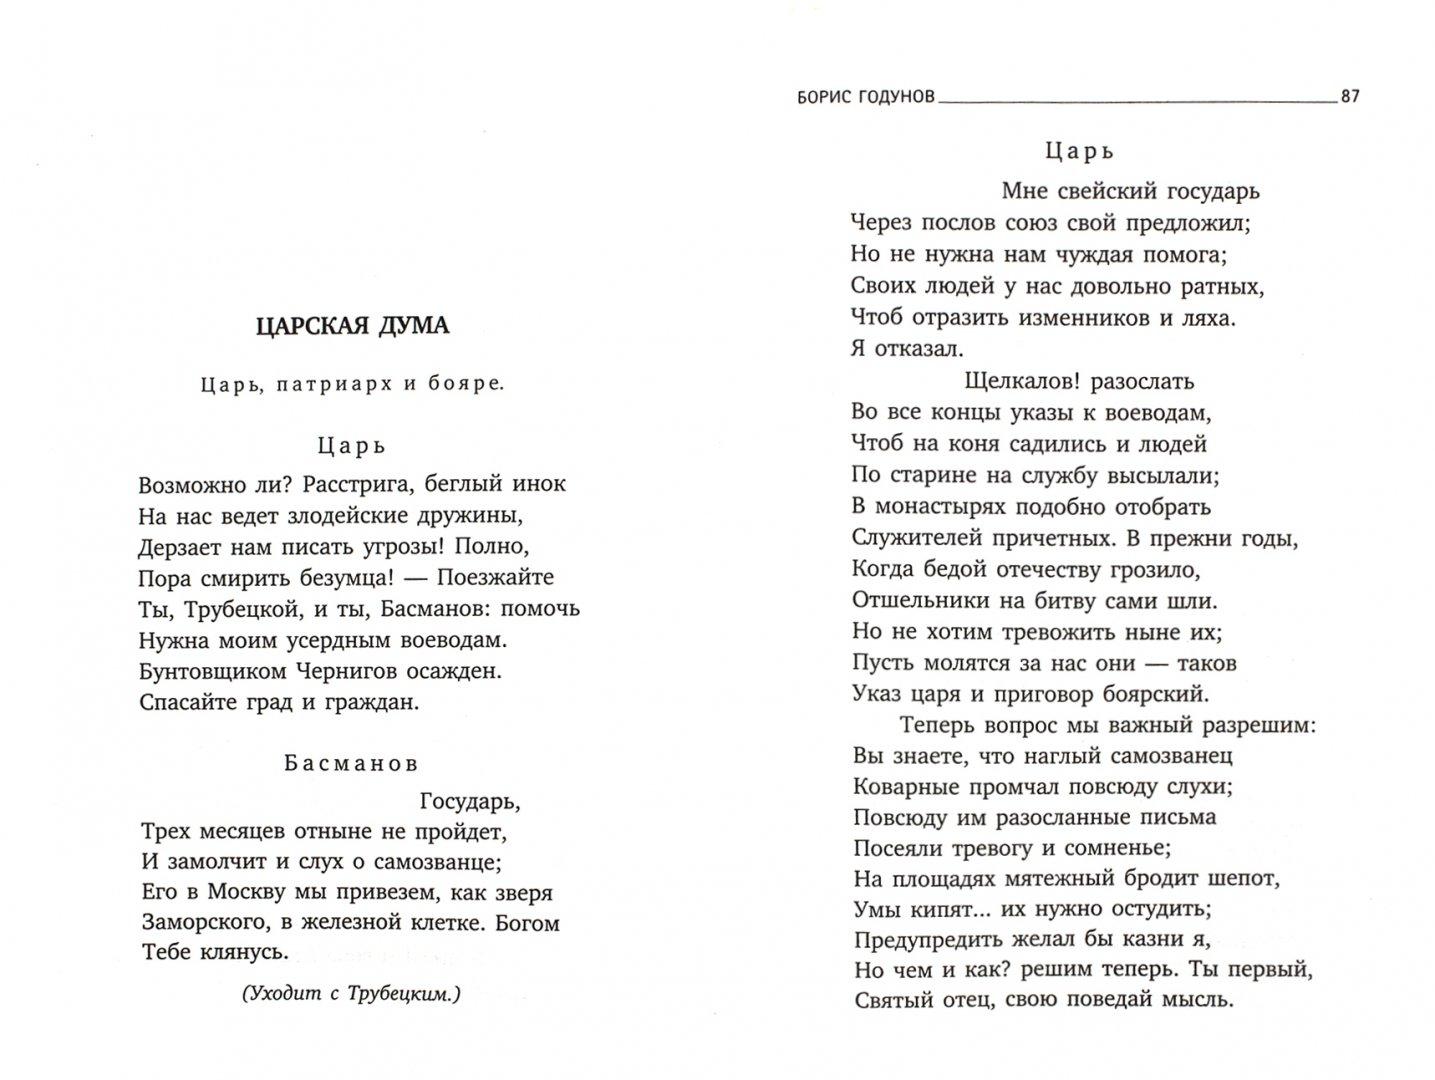 Иллюстрация 1 из 17 для Борис Годунов - Александр Пушкин | Лабиринт - книги. Источник: Лабиринт